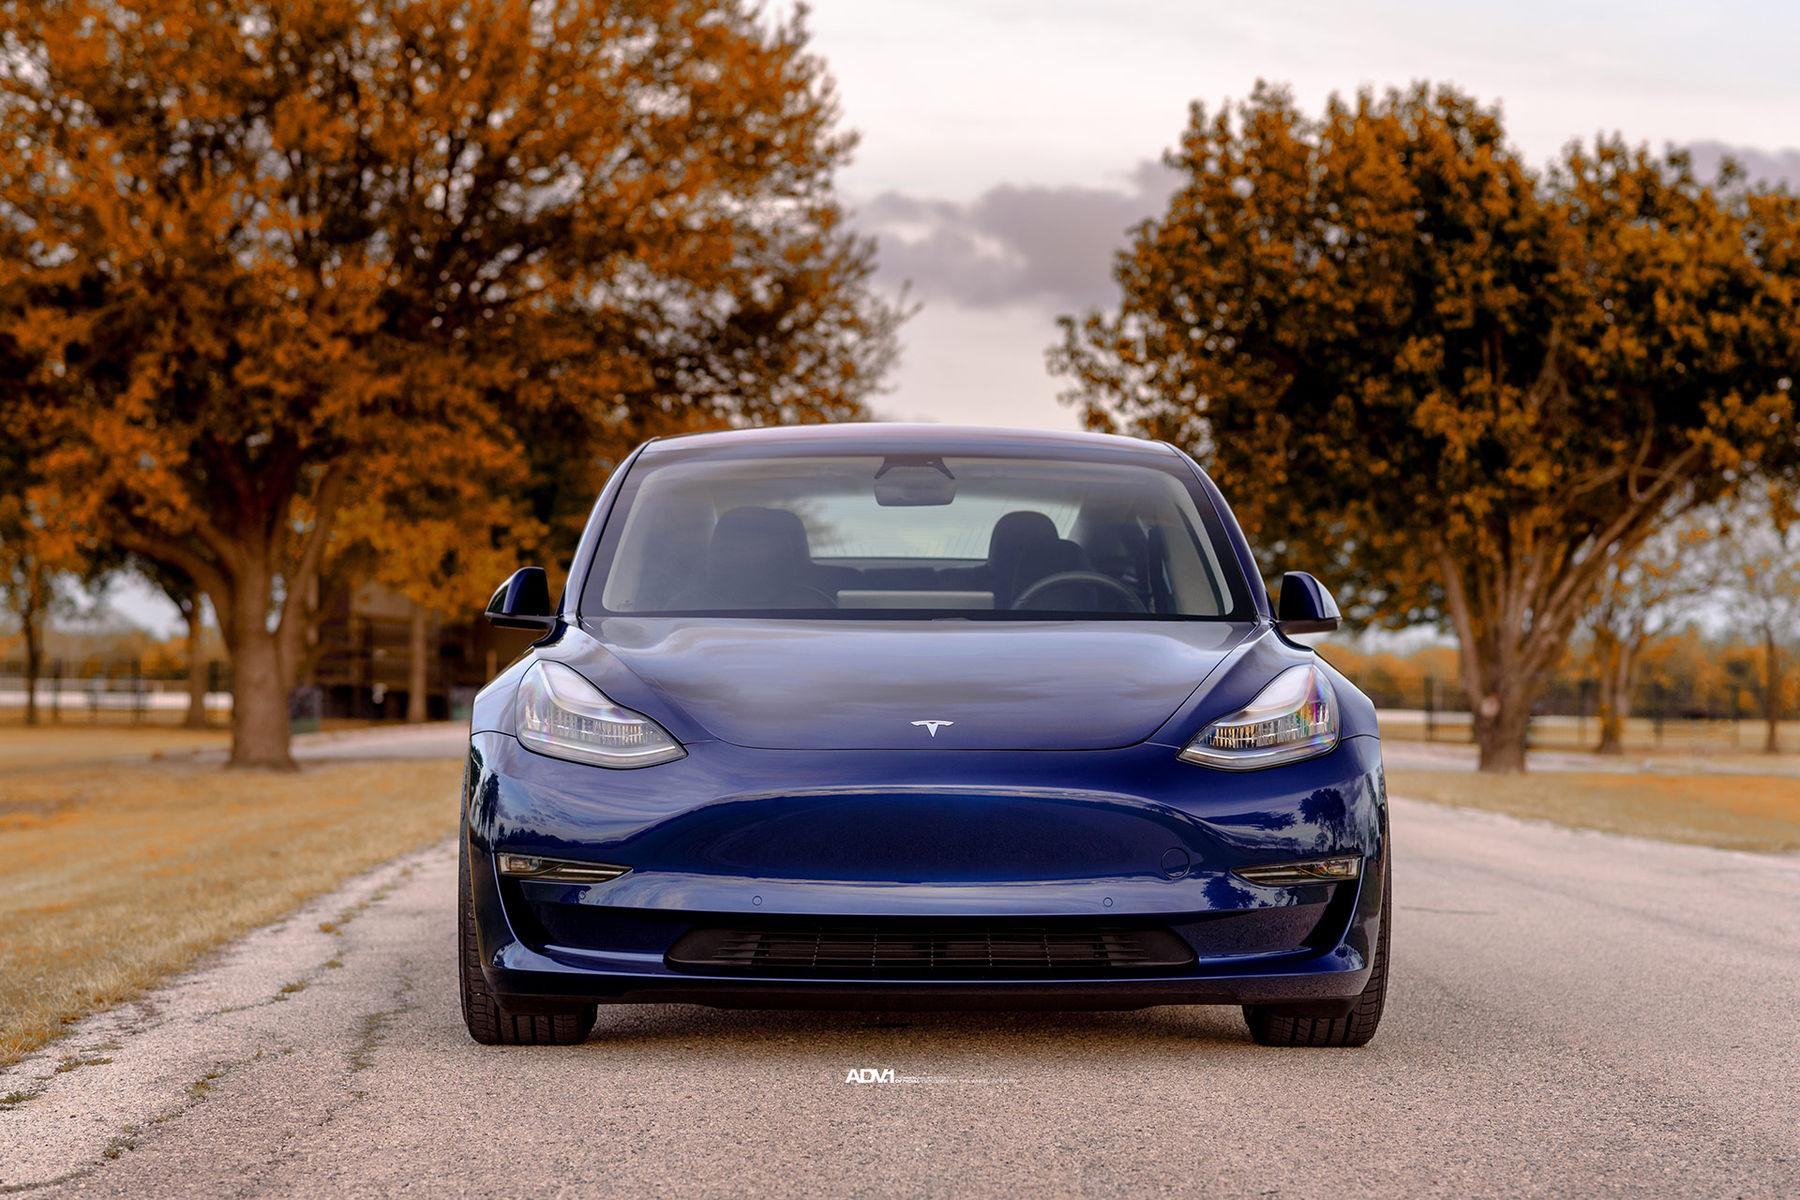 2018 Tesla    Tesla Model 3 - ADV.1 ADV5.0 M.V2 CS Series Wheels